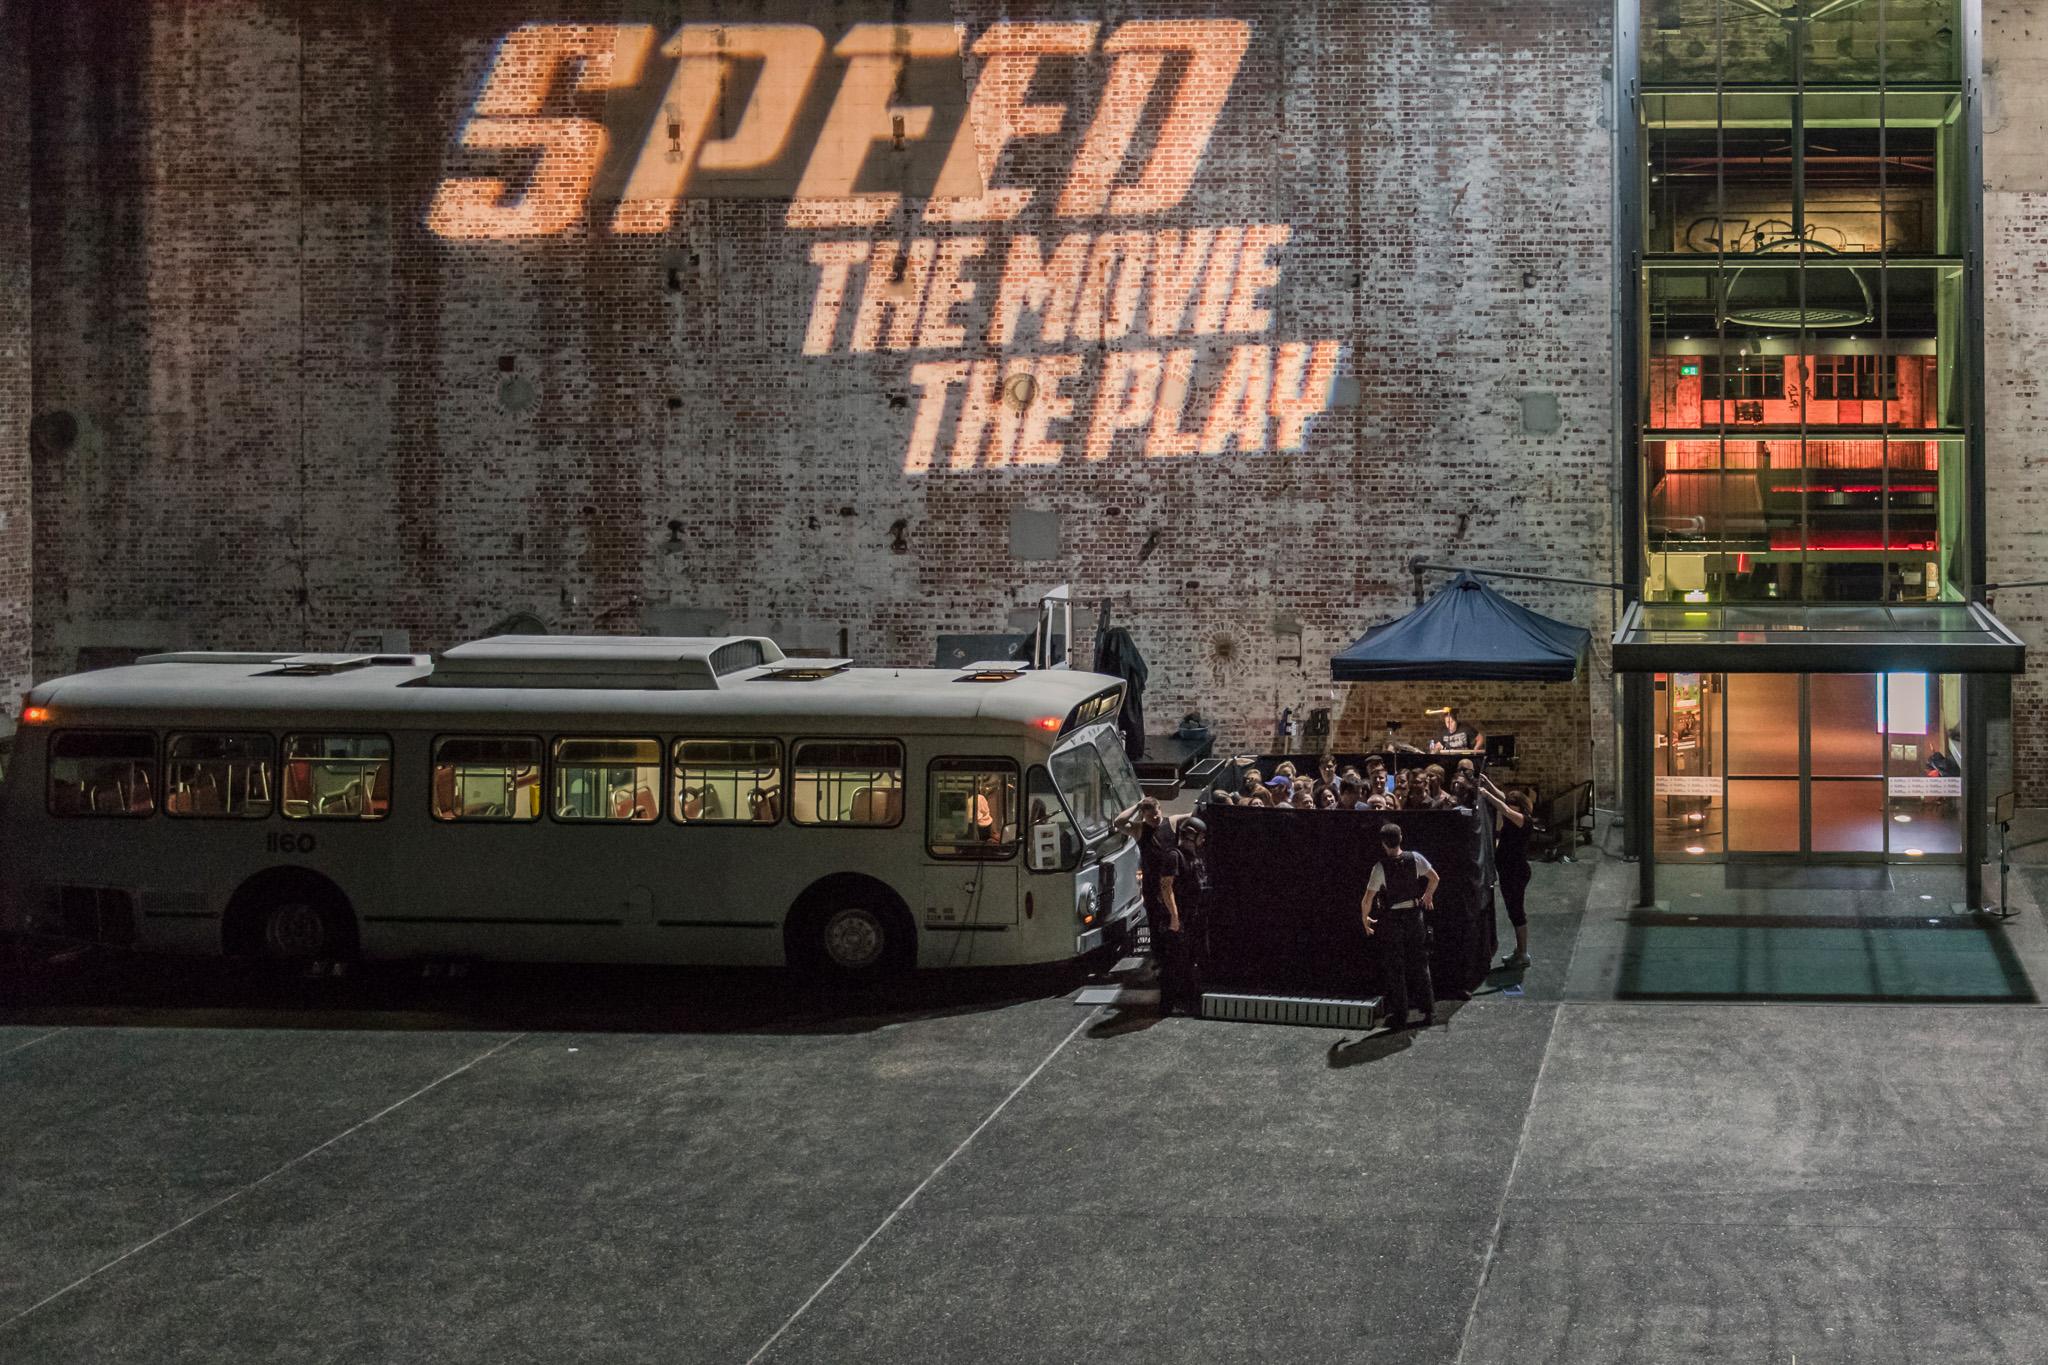 Speed-the-movie-the-play-02 (1).jpg